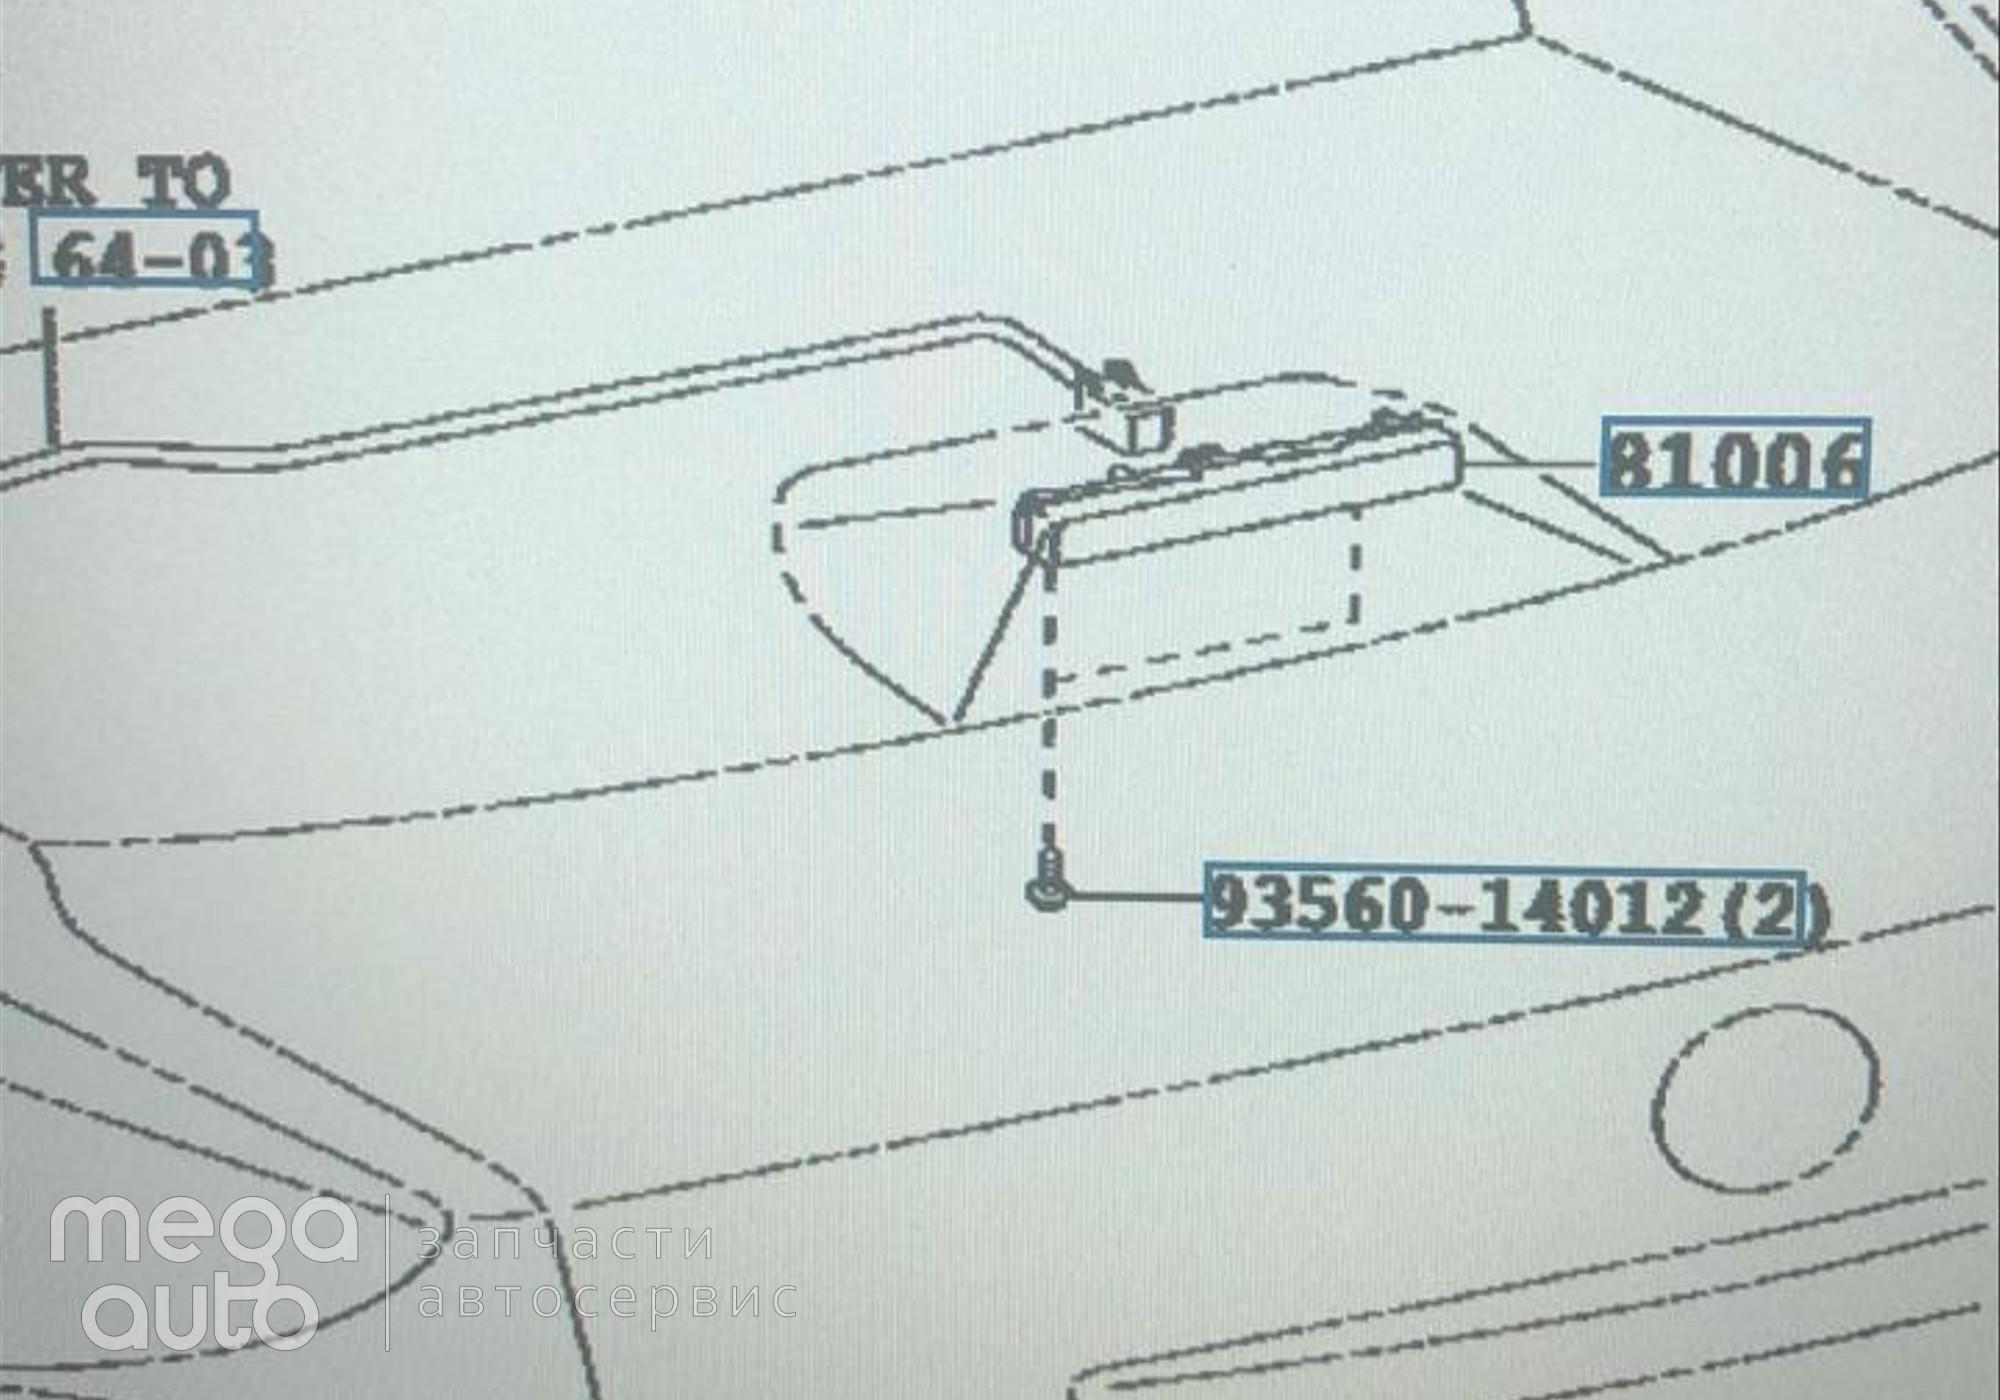 8100633010 Лампа стоп сигнала для Toyota Corolla E140/E150 (с 2007 по 2013)